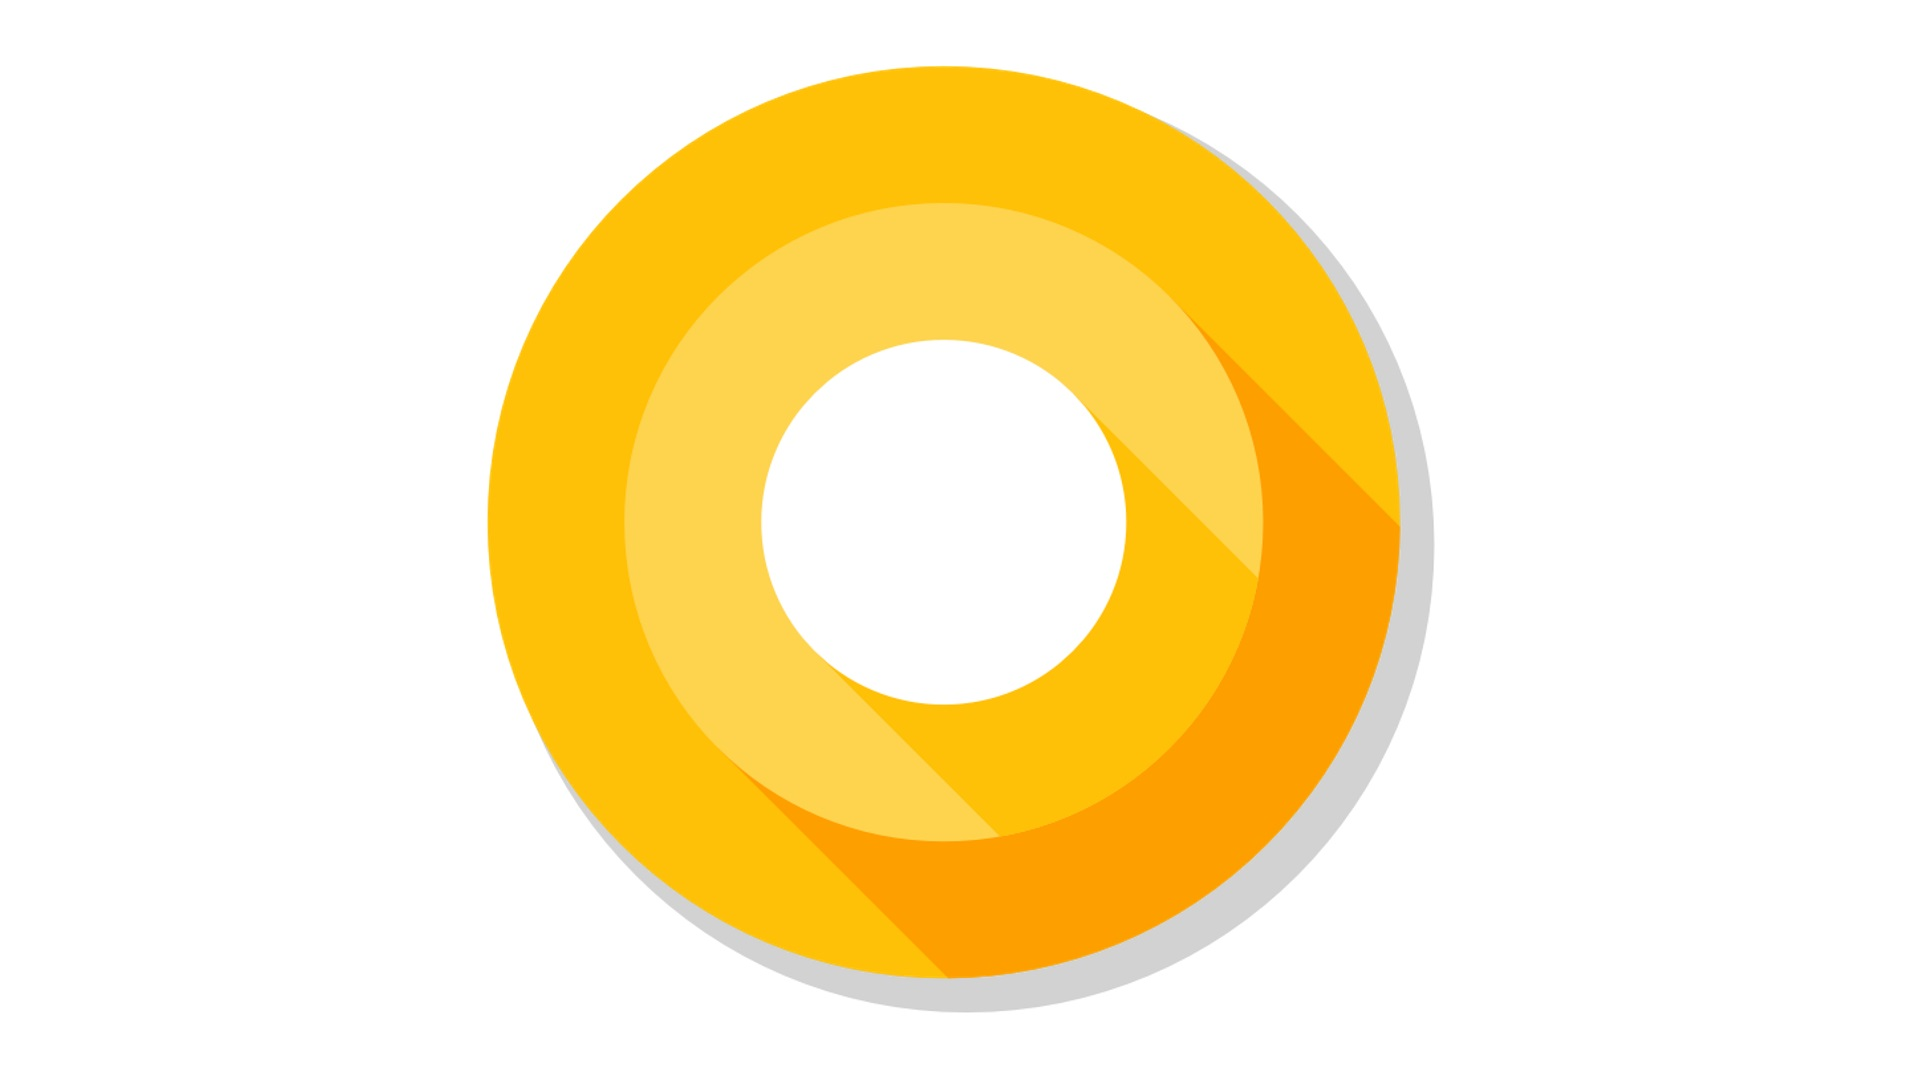 Google、次期OSバージョン「Android O」のDeveloper Preview(DP1)を公開、Android Beta版はDP4以降